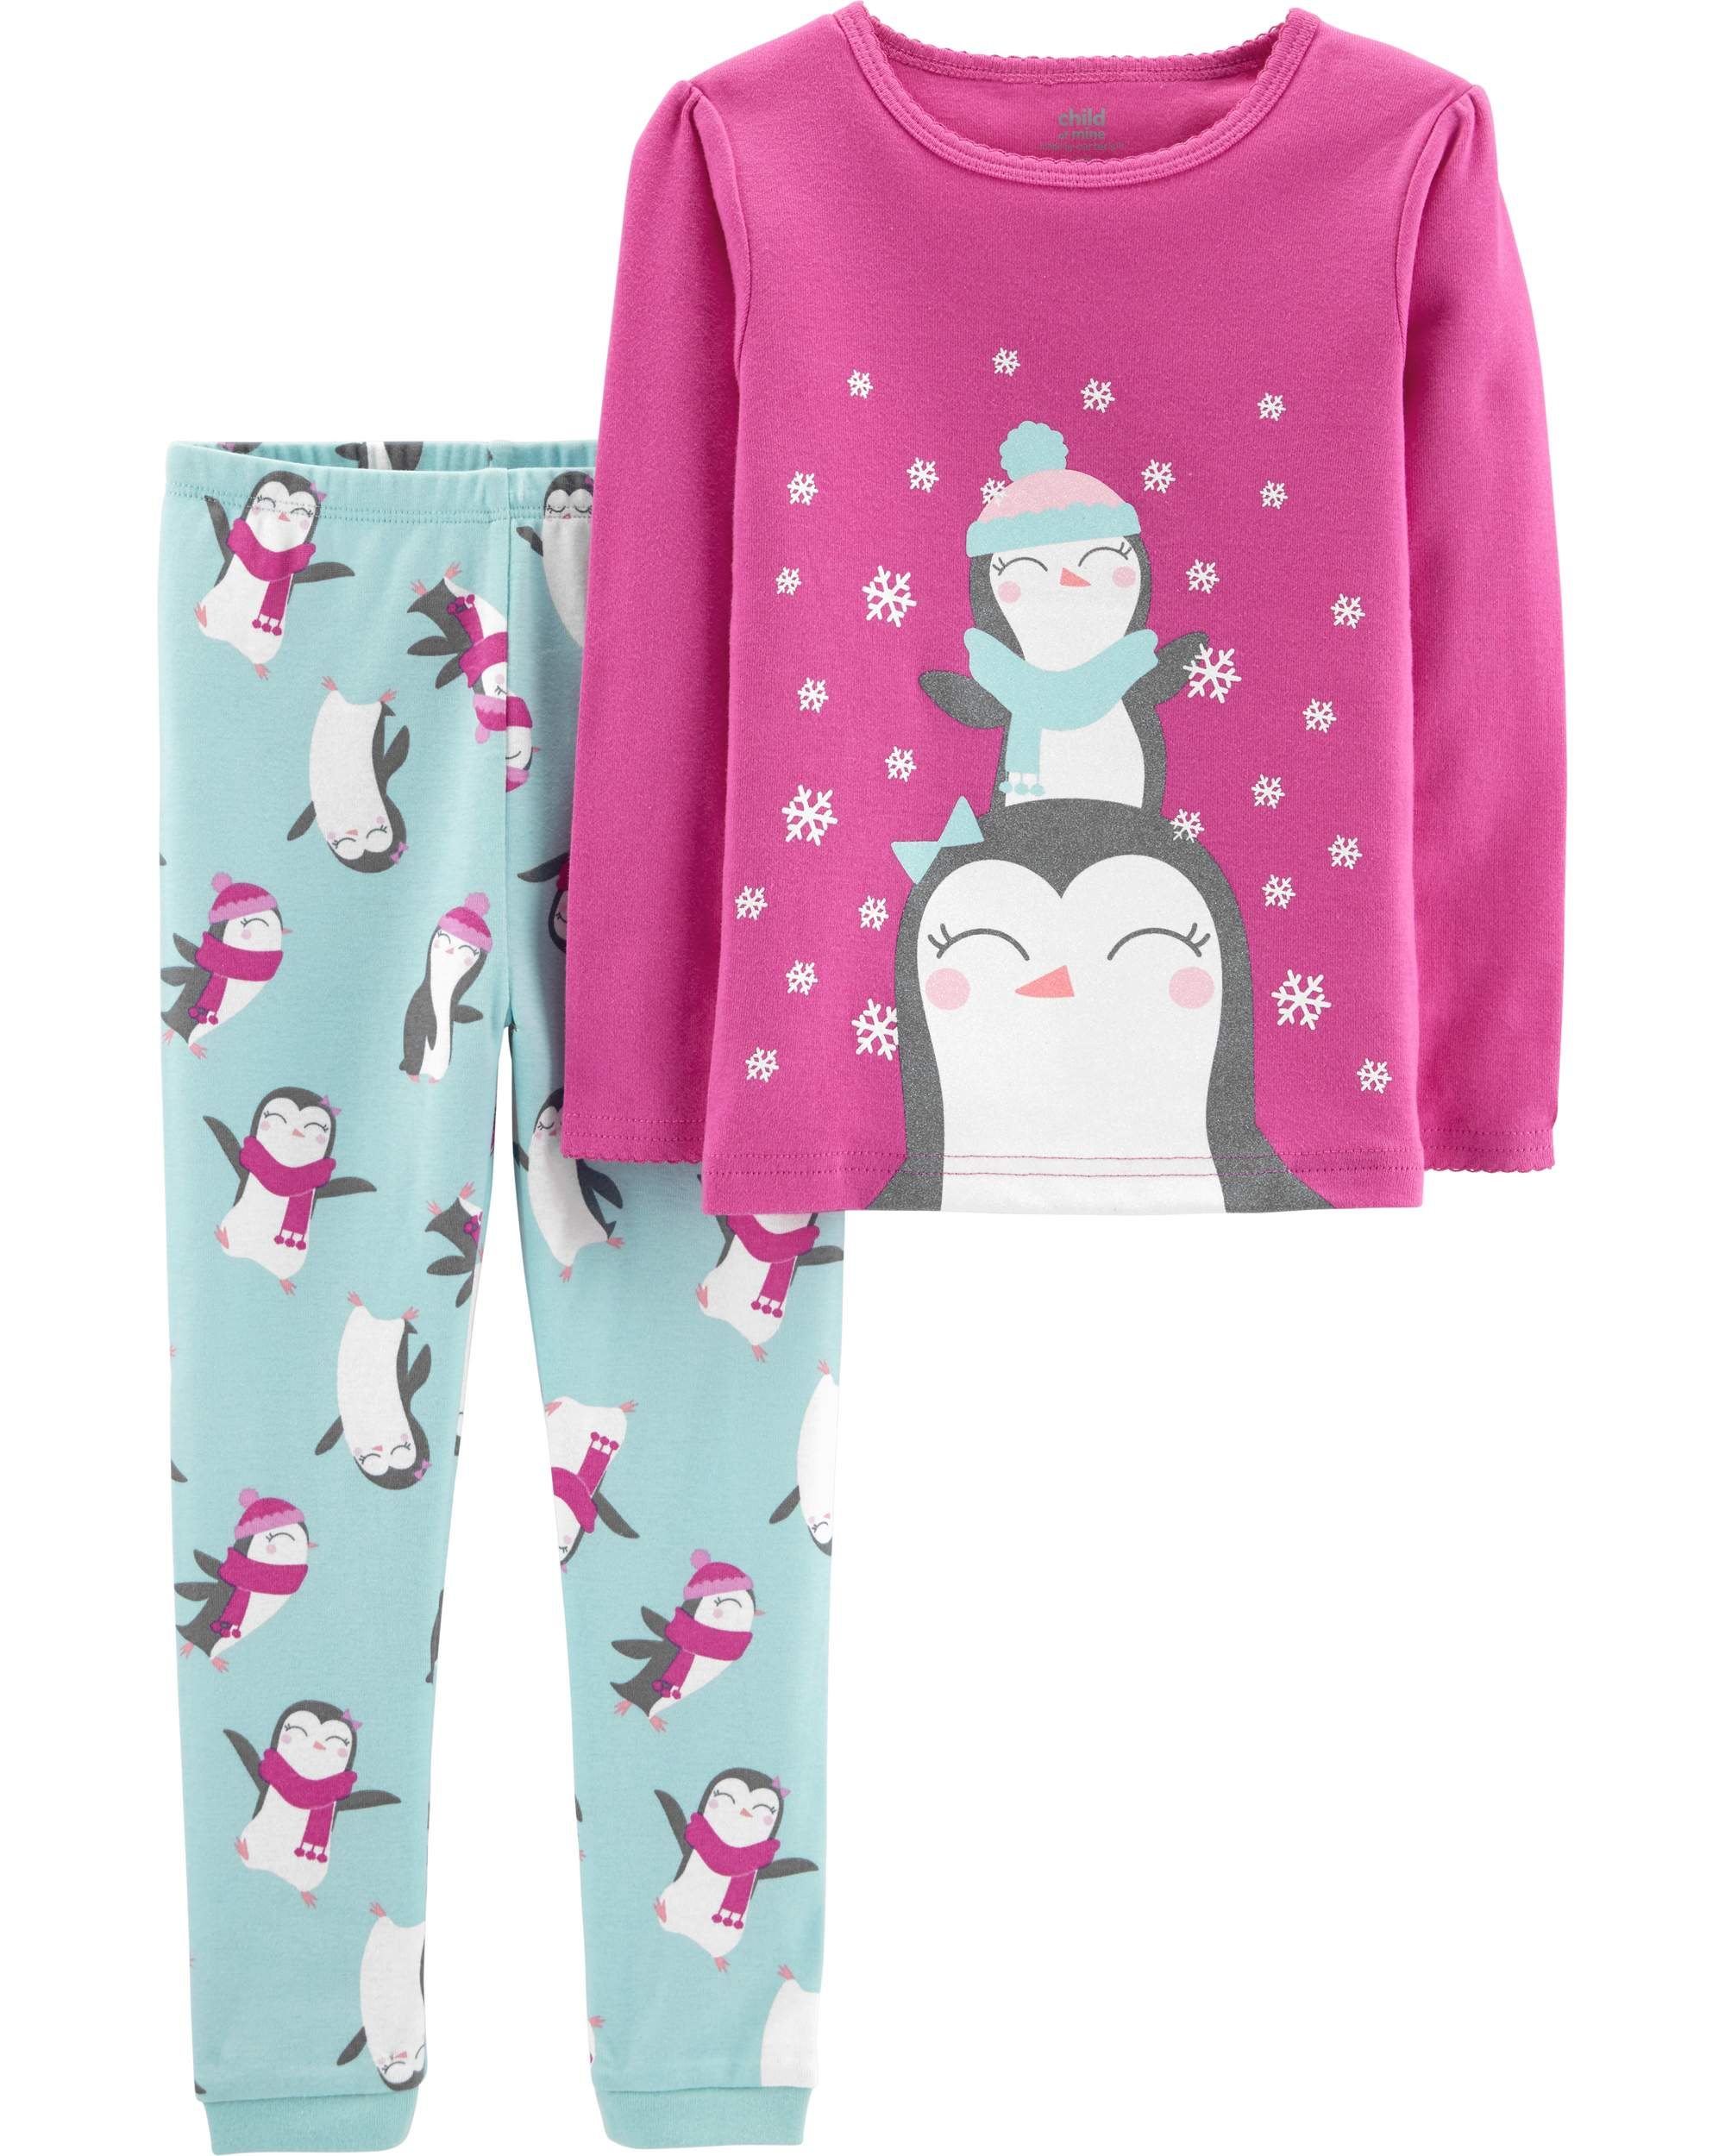 Christmas Penguin Long Sleeve Cotton Tight Fit Pajamas, 2-piece Set (Baby Girls & Toddler Girls)